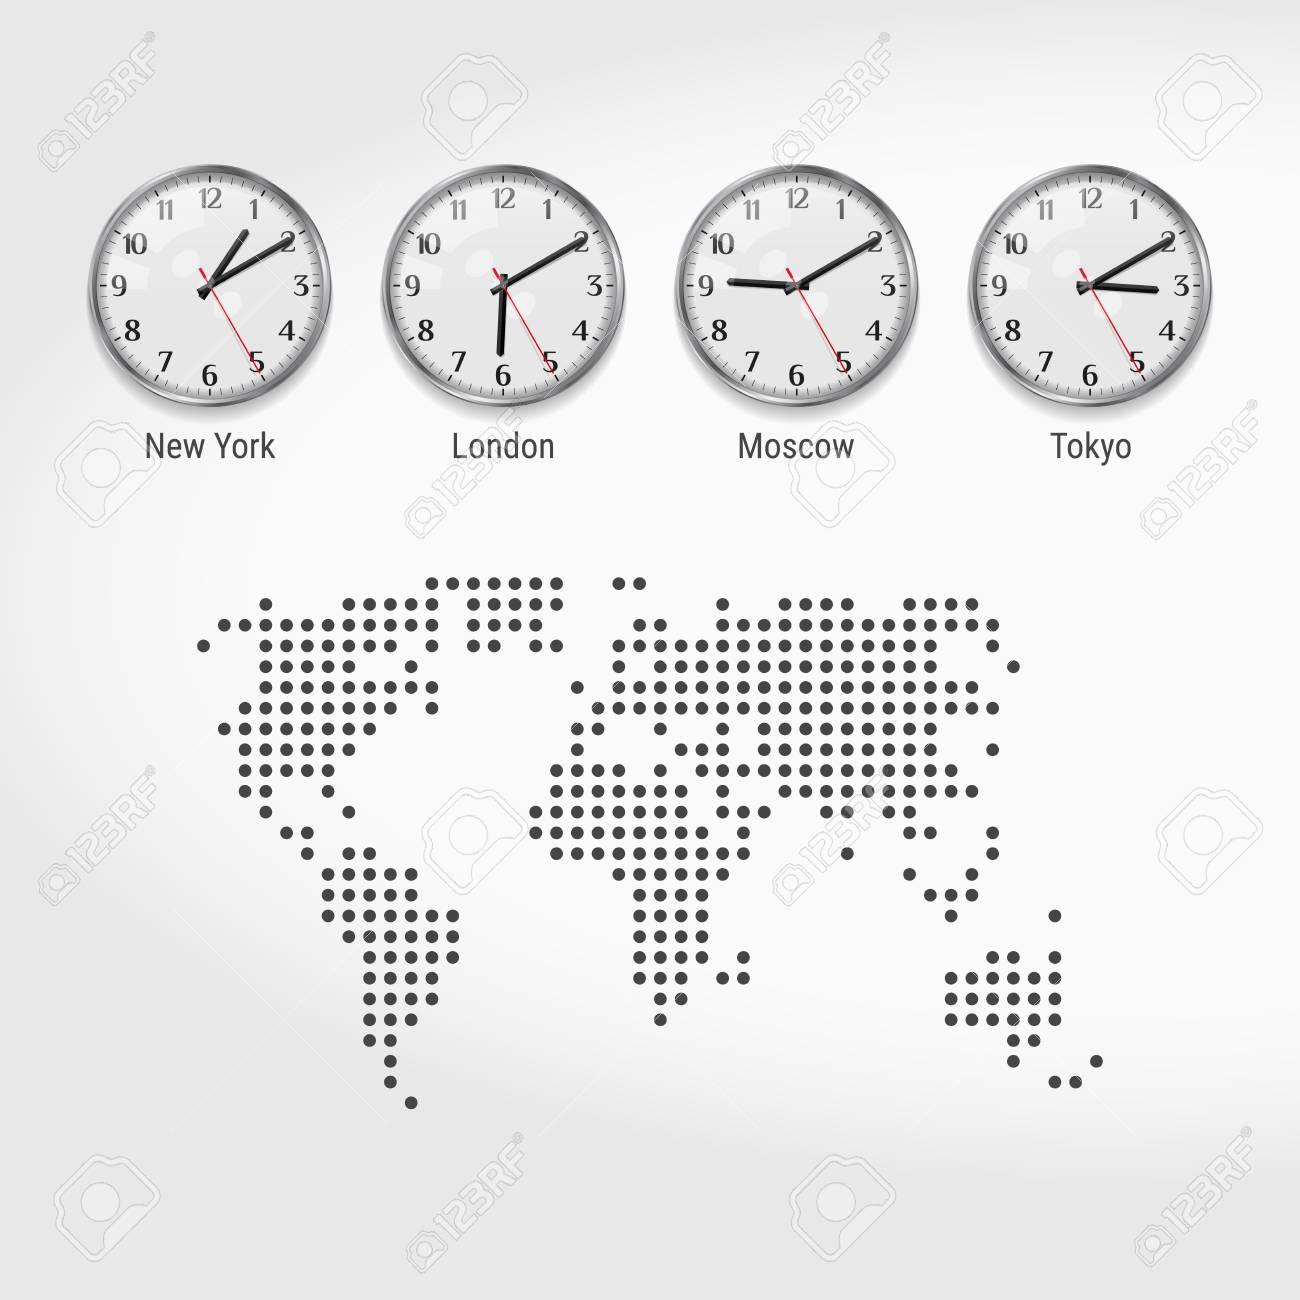 world time zones clocks